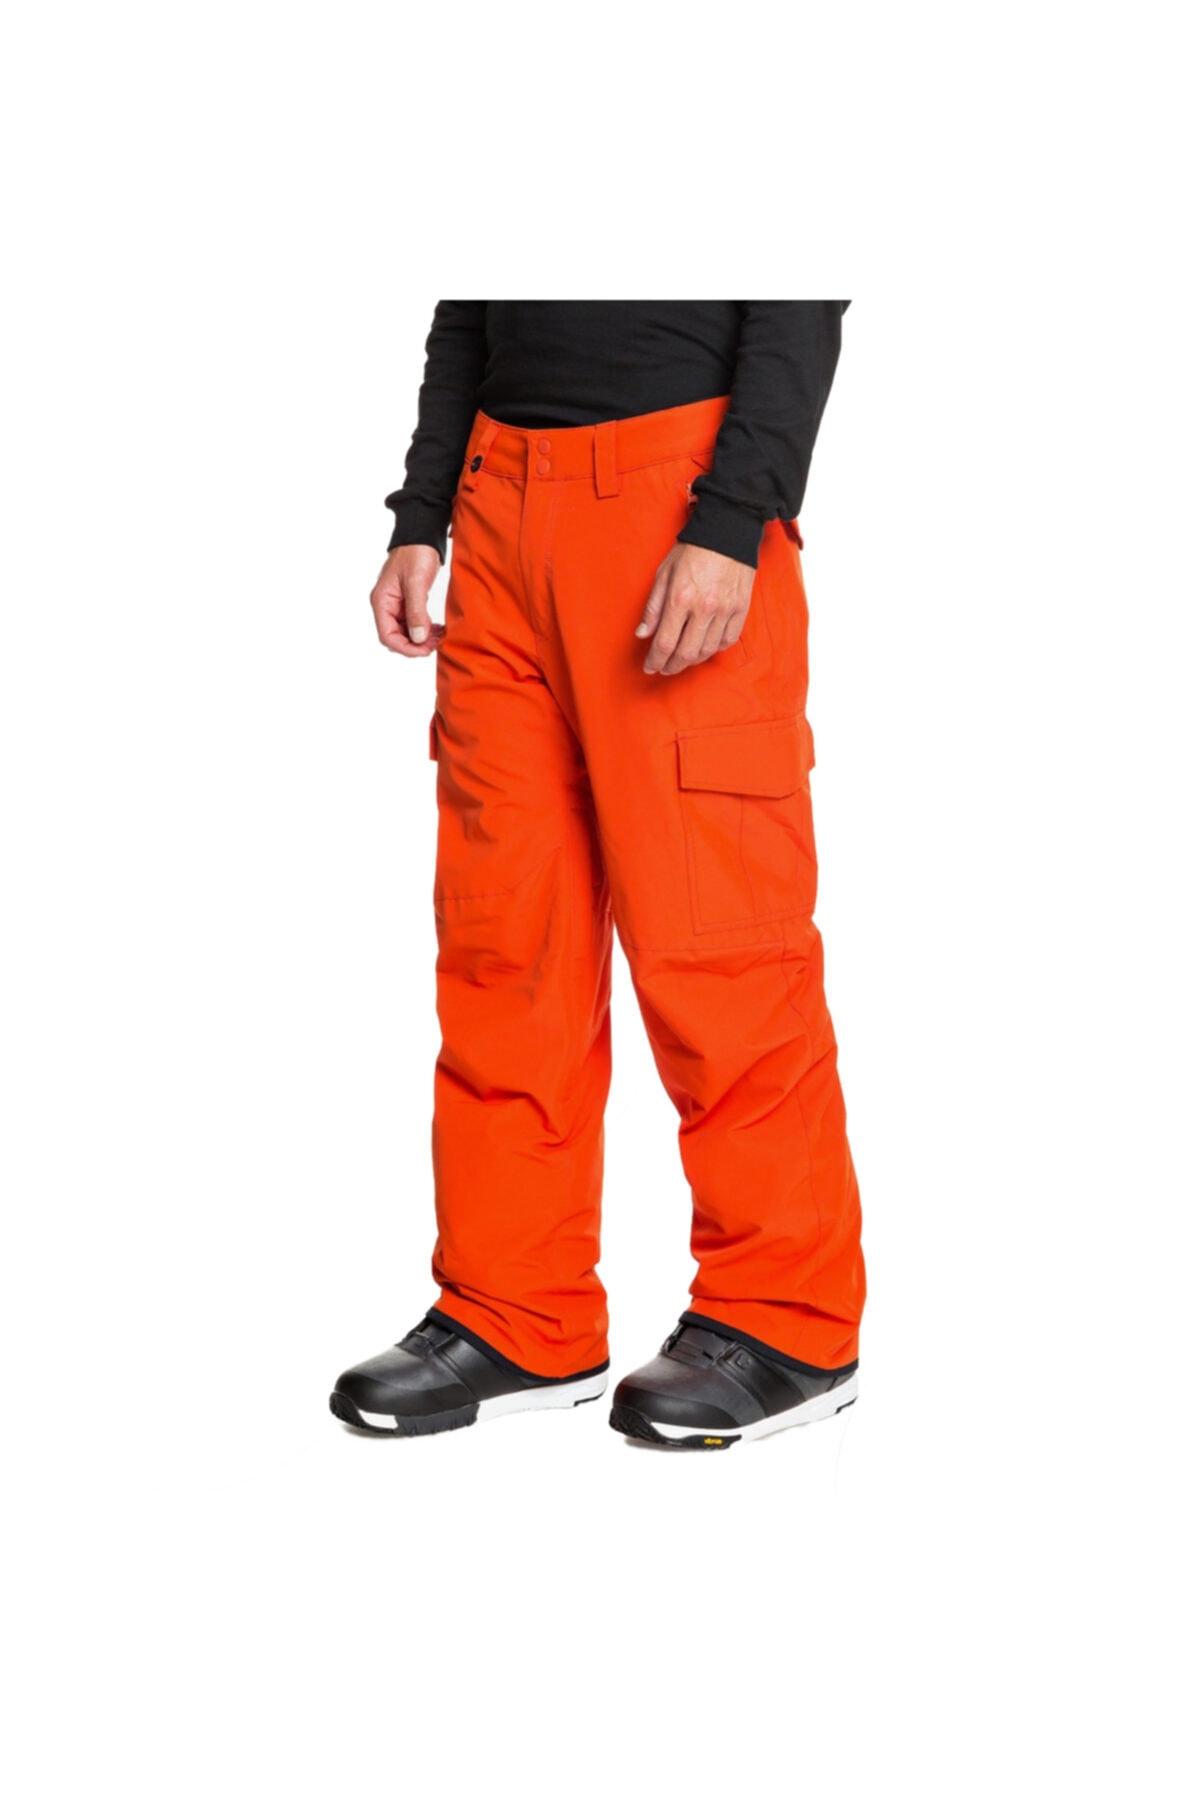 Quiksilver Quıksılver Porter Erkek Snowboard Pantolonu 2